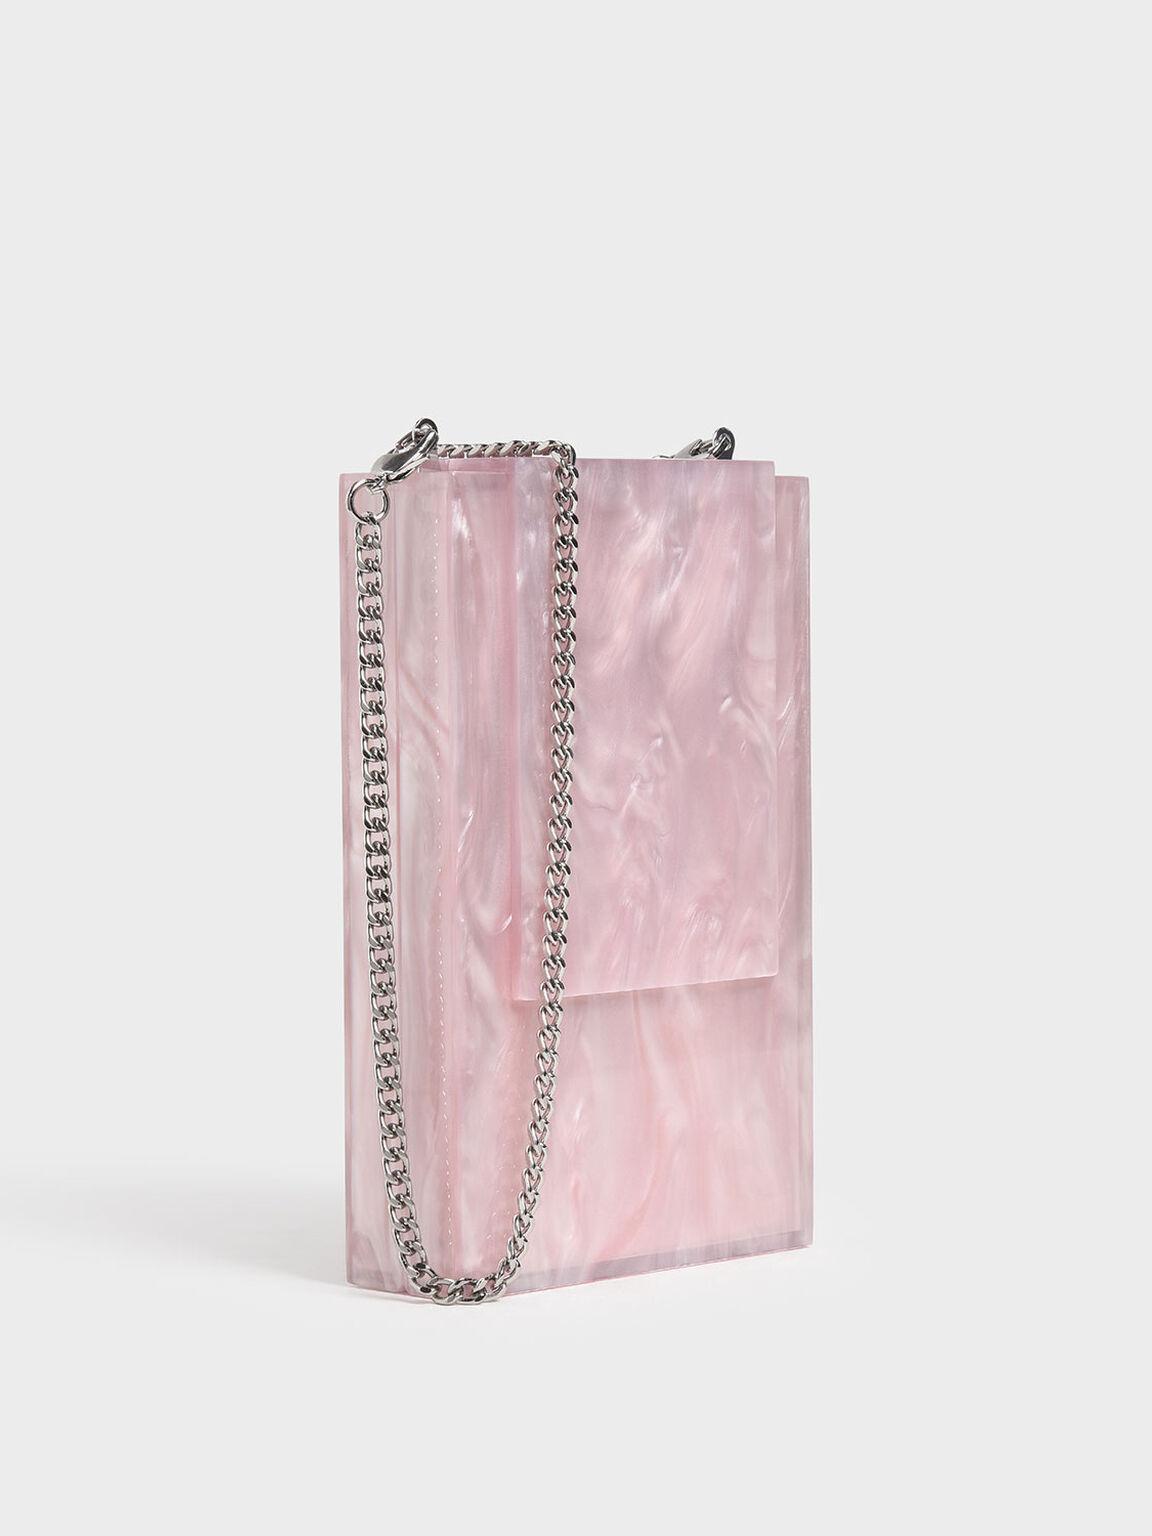 Resin Clutch, Pink, hi-res